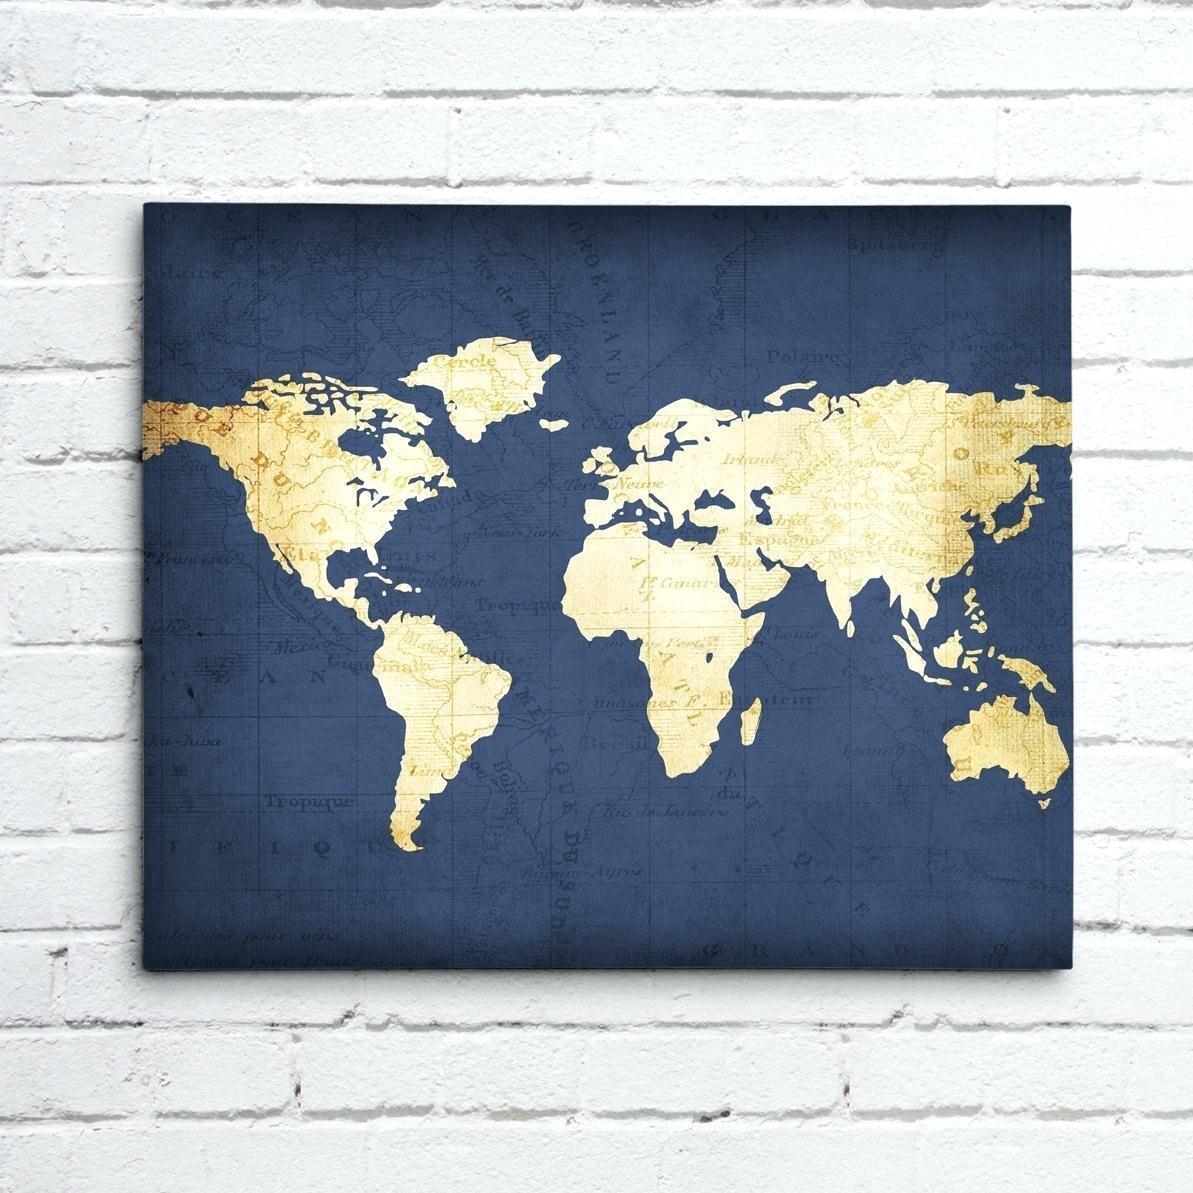 Wall Ideas : Thumbnail 1 World Map Wall Art World Map Art Canvas Within Groupon Wall Art (View 19 of 20)